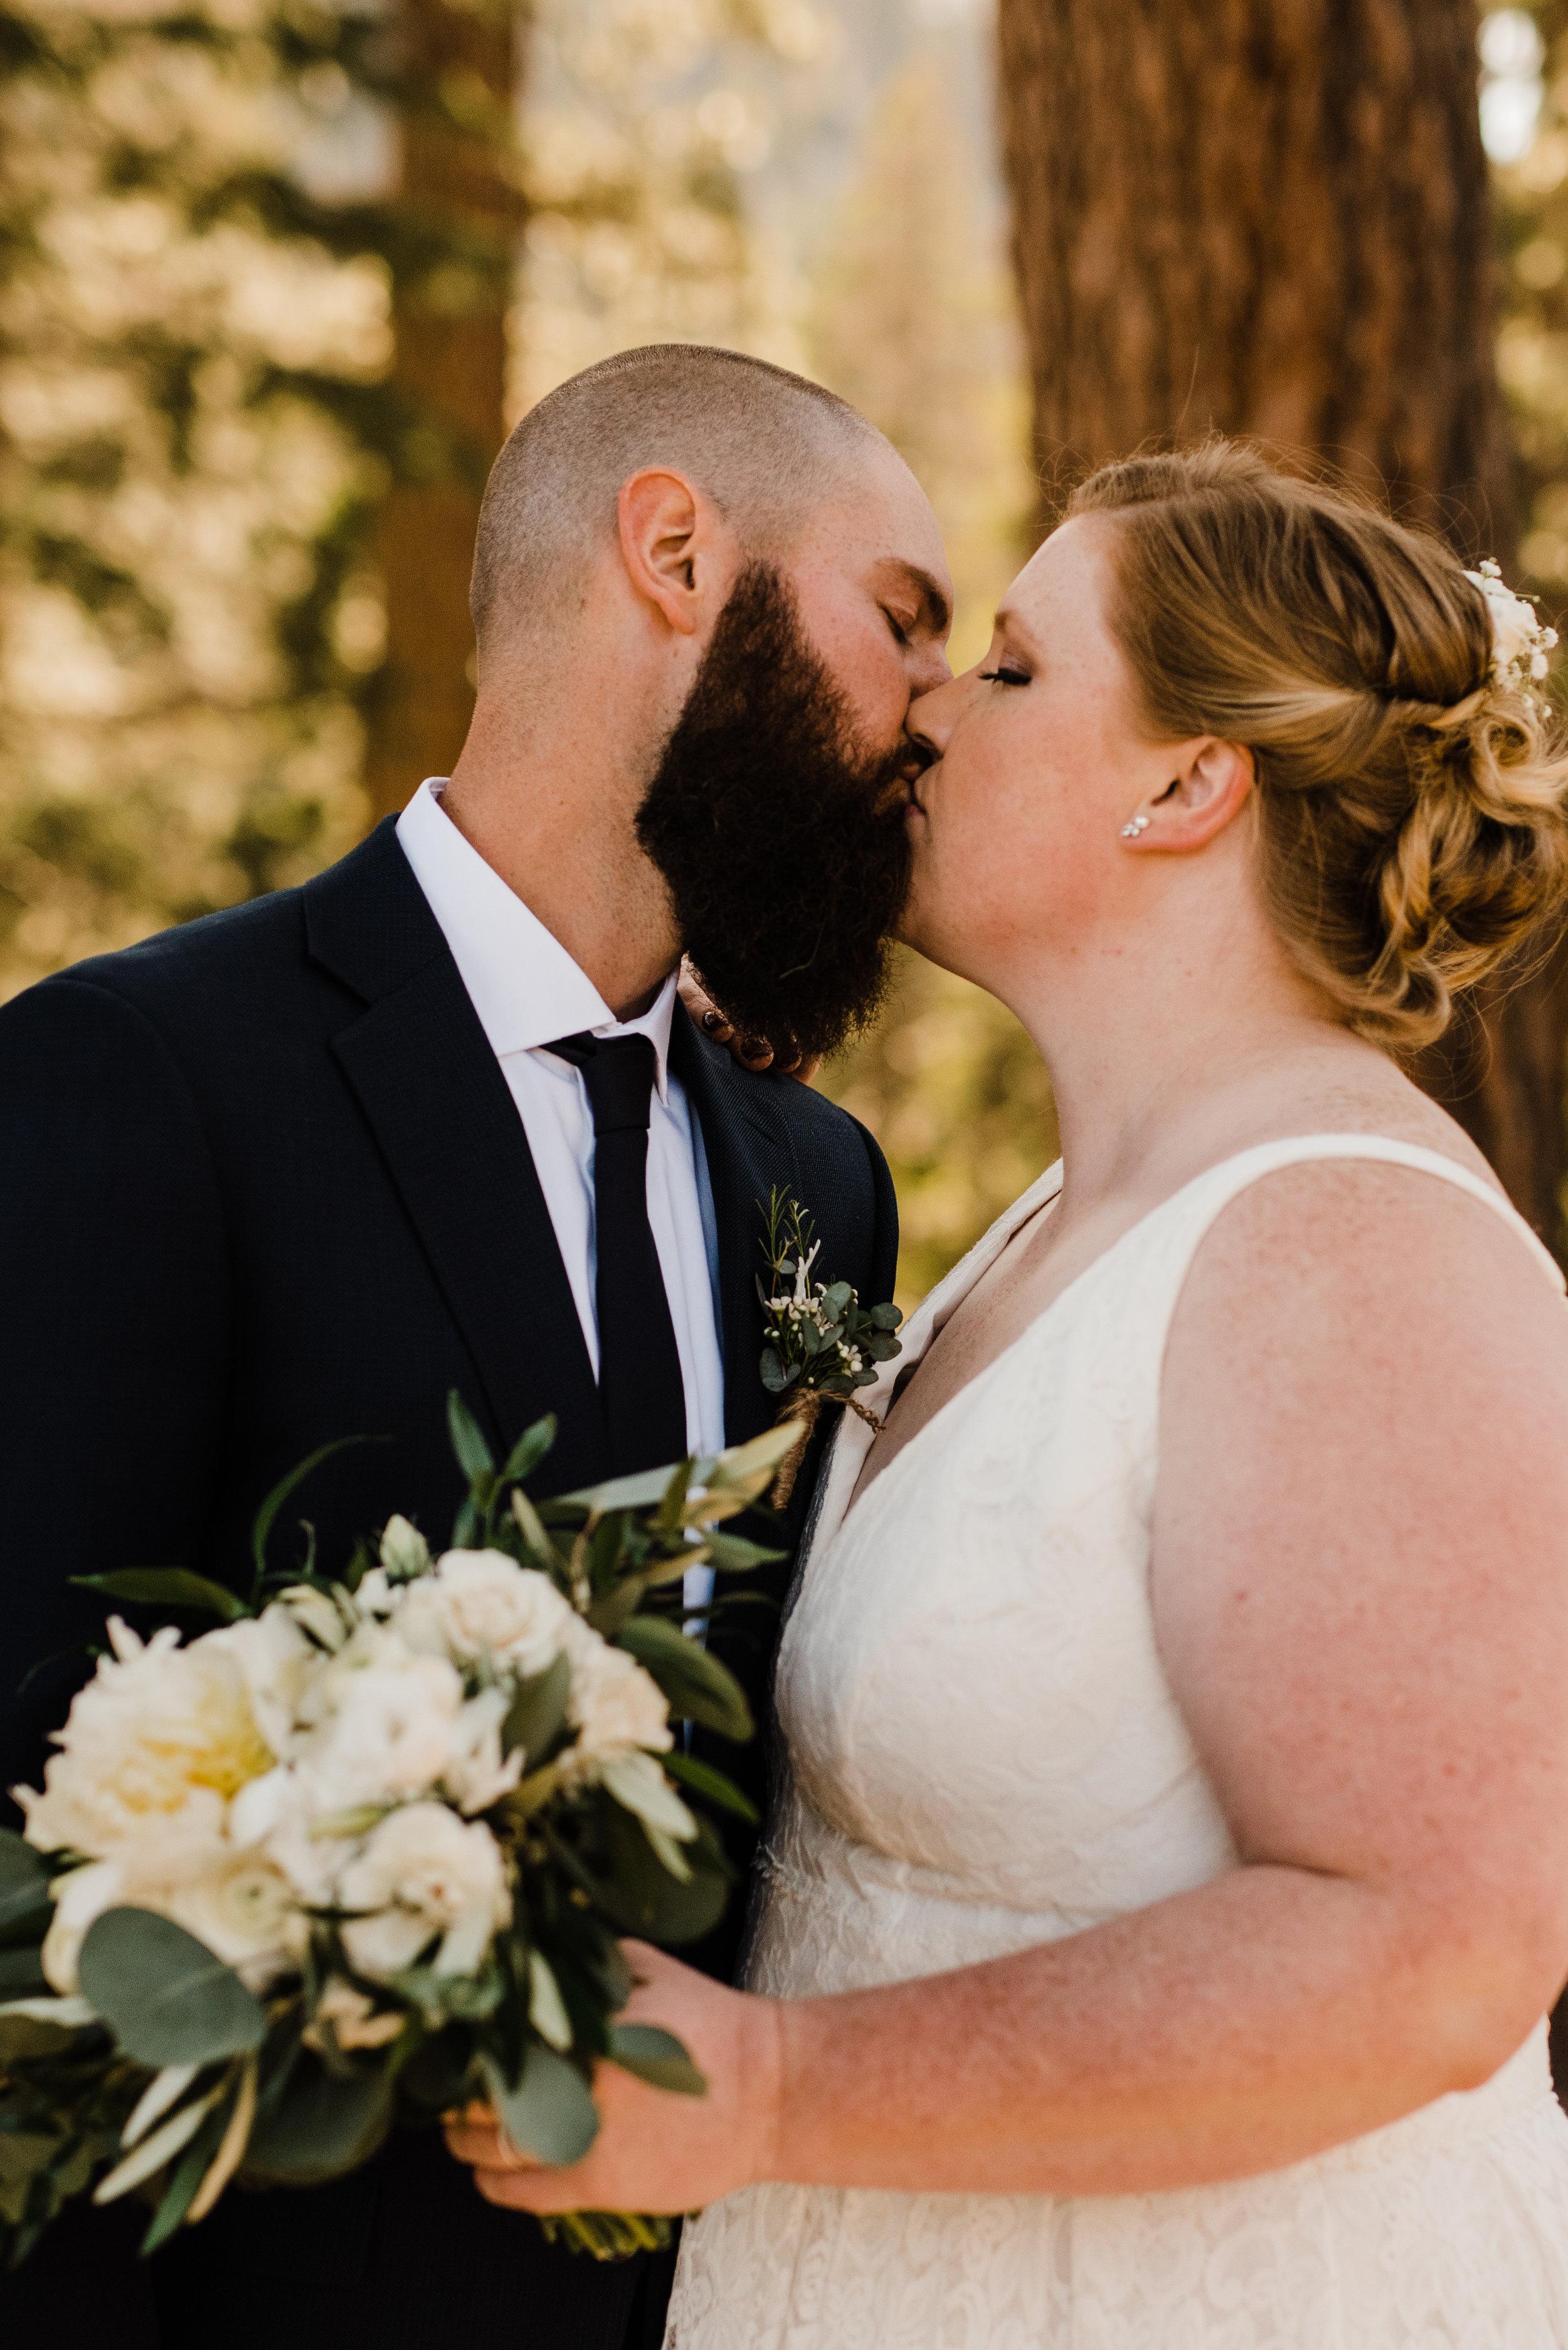 Summer Bride and Groom Kiss Beneath Trees at Yosemite National Park